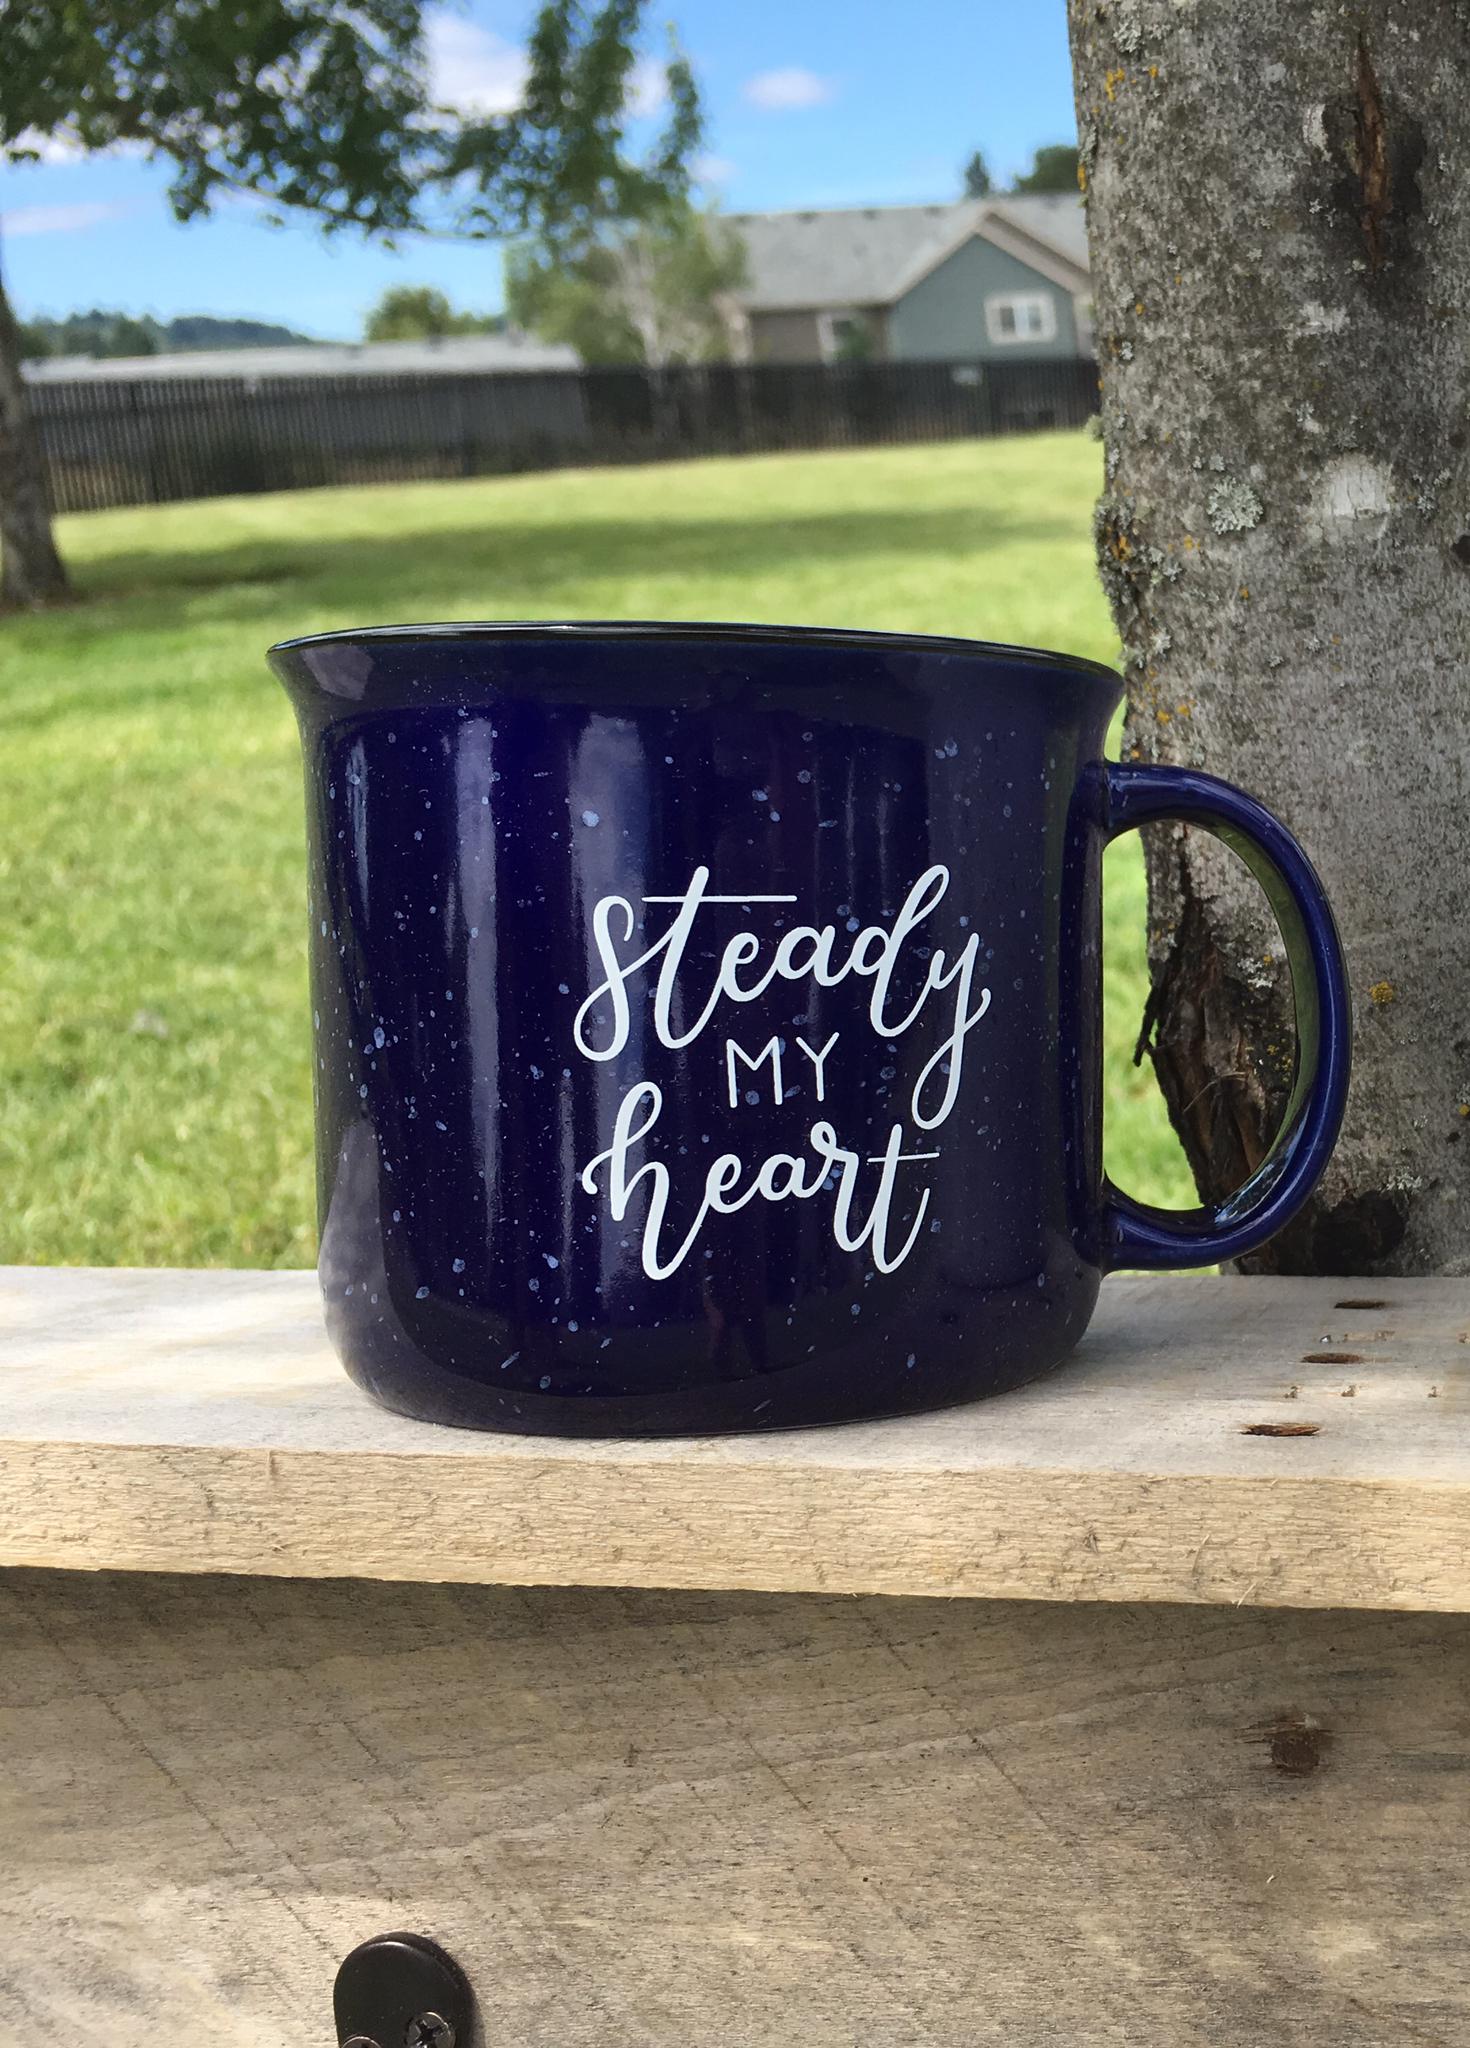 Cobalt Blue Steady My Heart Campfire Mug sitting on a handmade shelf by @piece.in.mind in a park